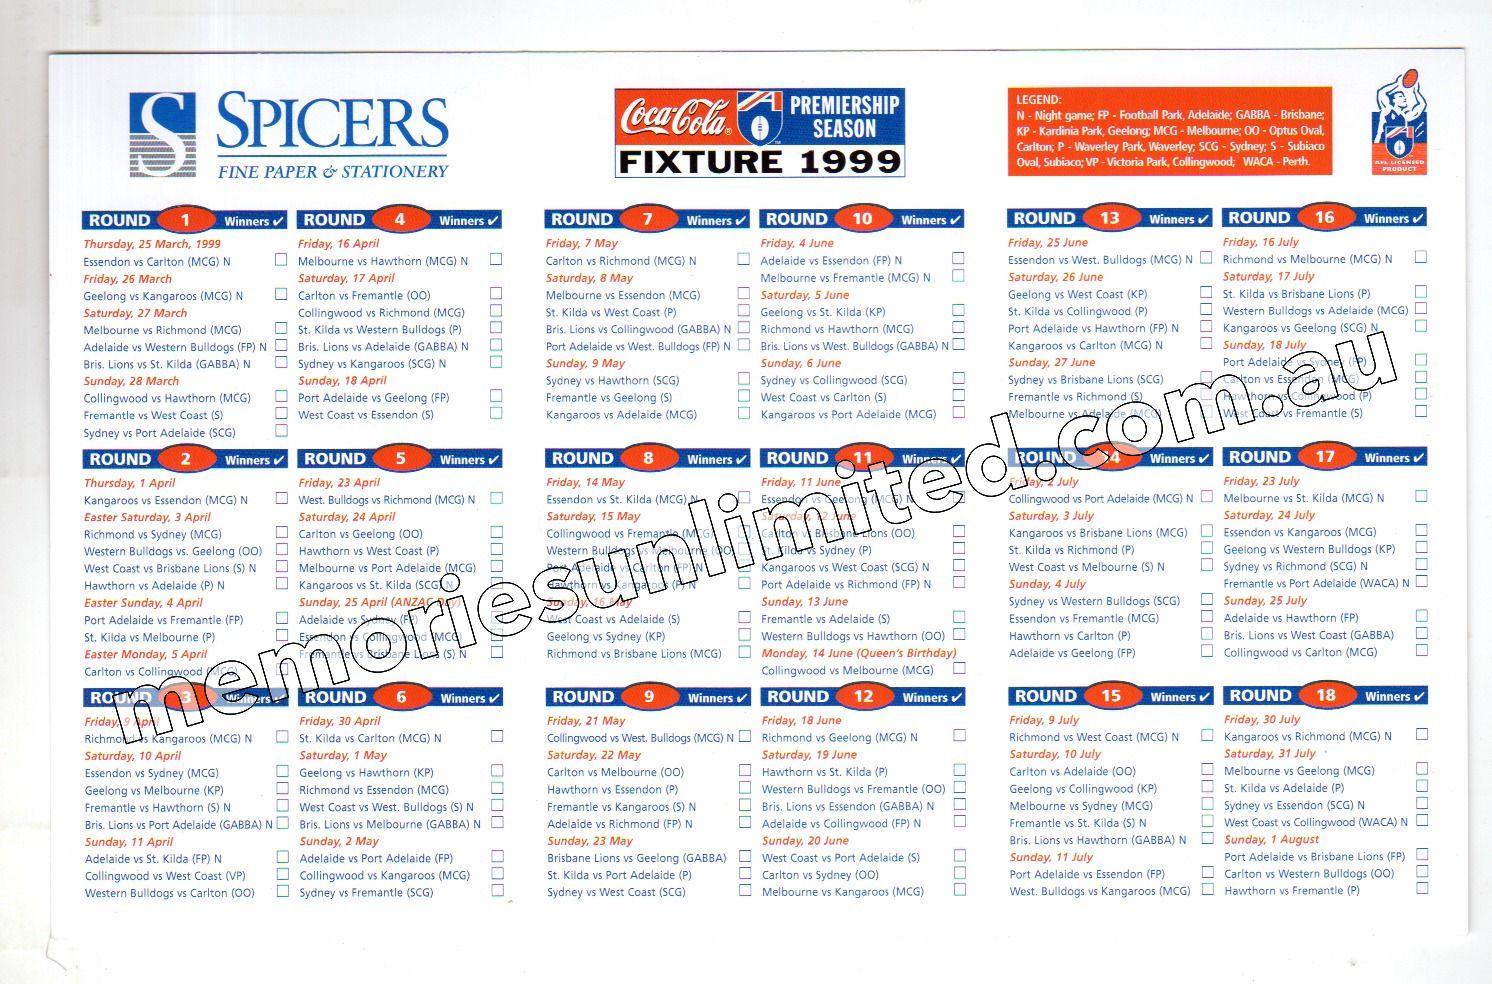 1999 SPICERS (1999 AFL FOOTBALL FIXTURE)